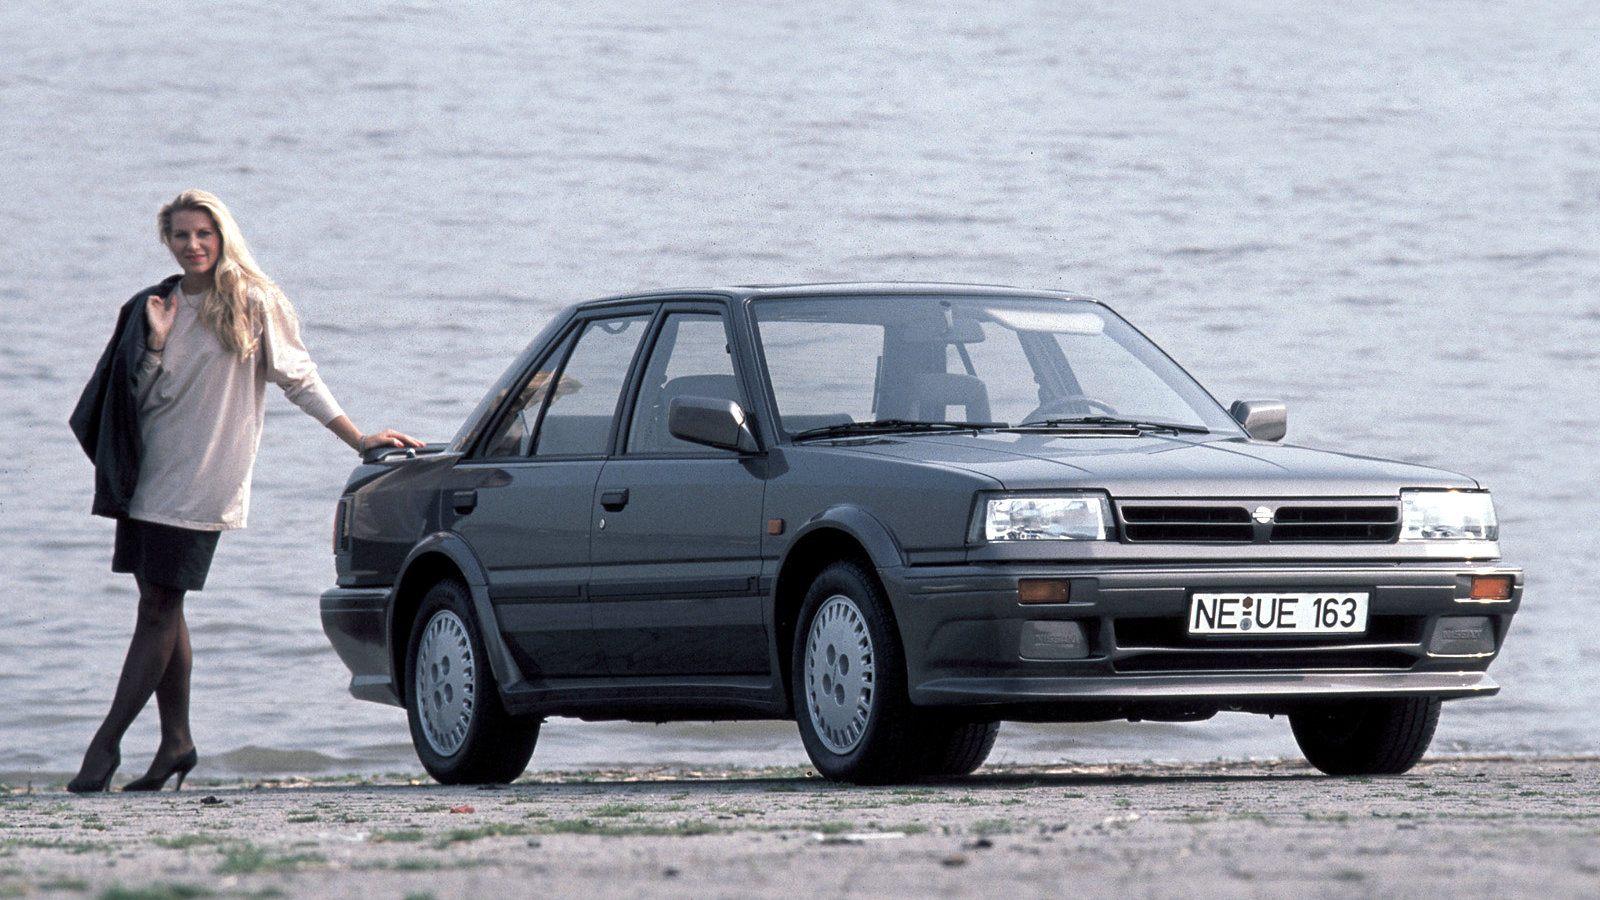 Nissan Bluebird 1800 Turbo SGX 3